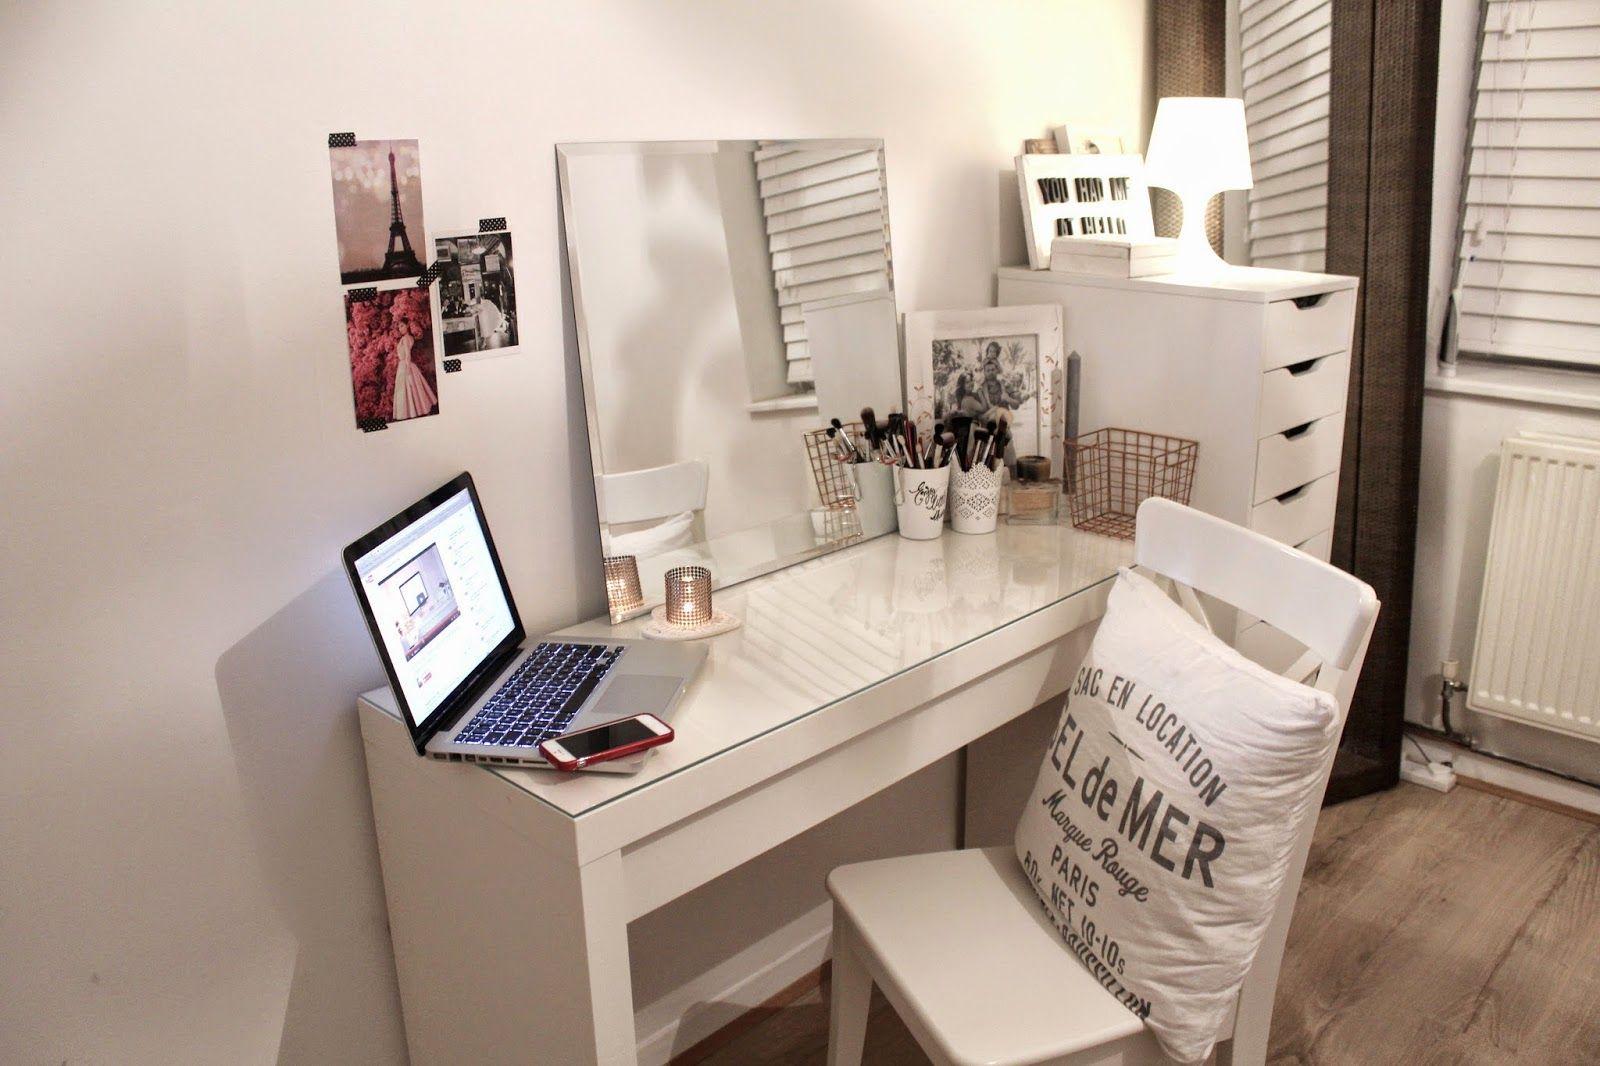 My Ikea Bedroom With Alex Drawers Google Search Malm Dressing Table Ikea Malm Dressing Table Minimalist Bedroom Decor